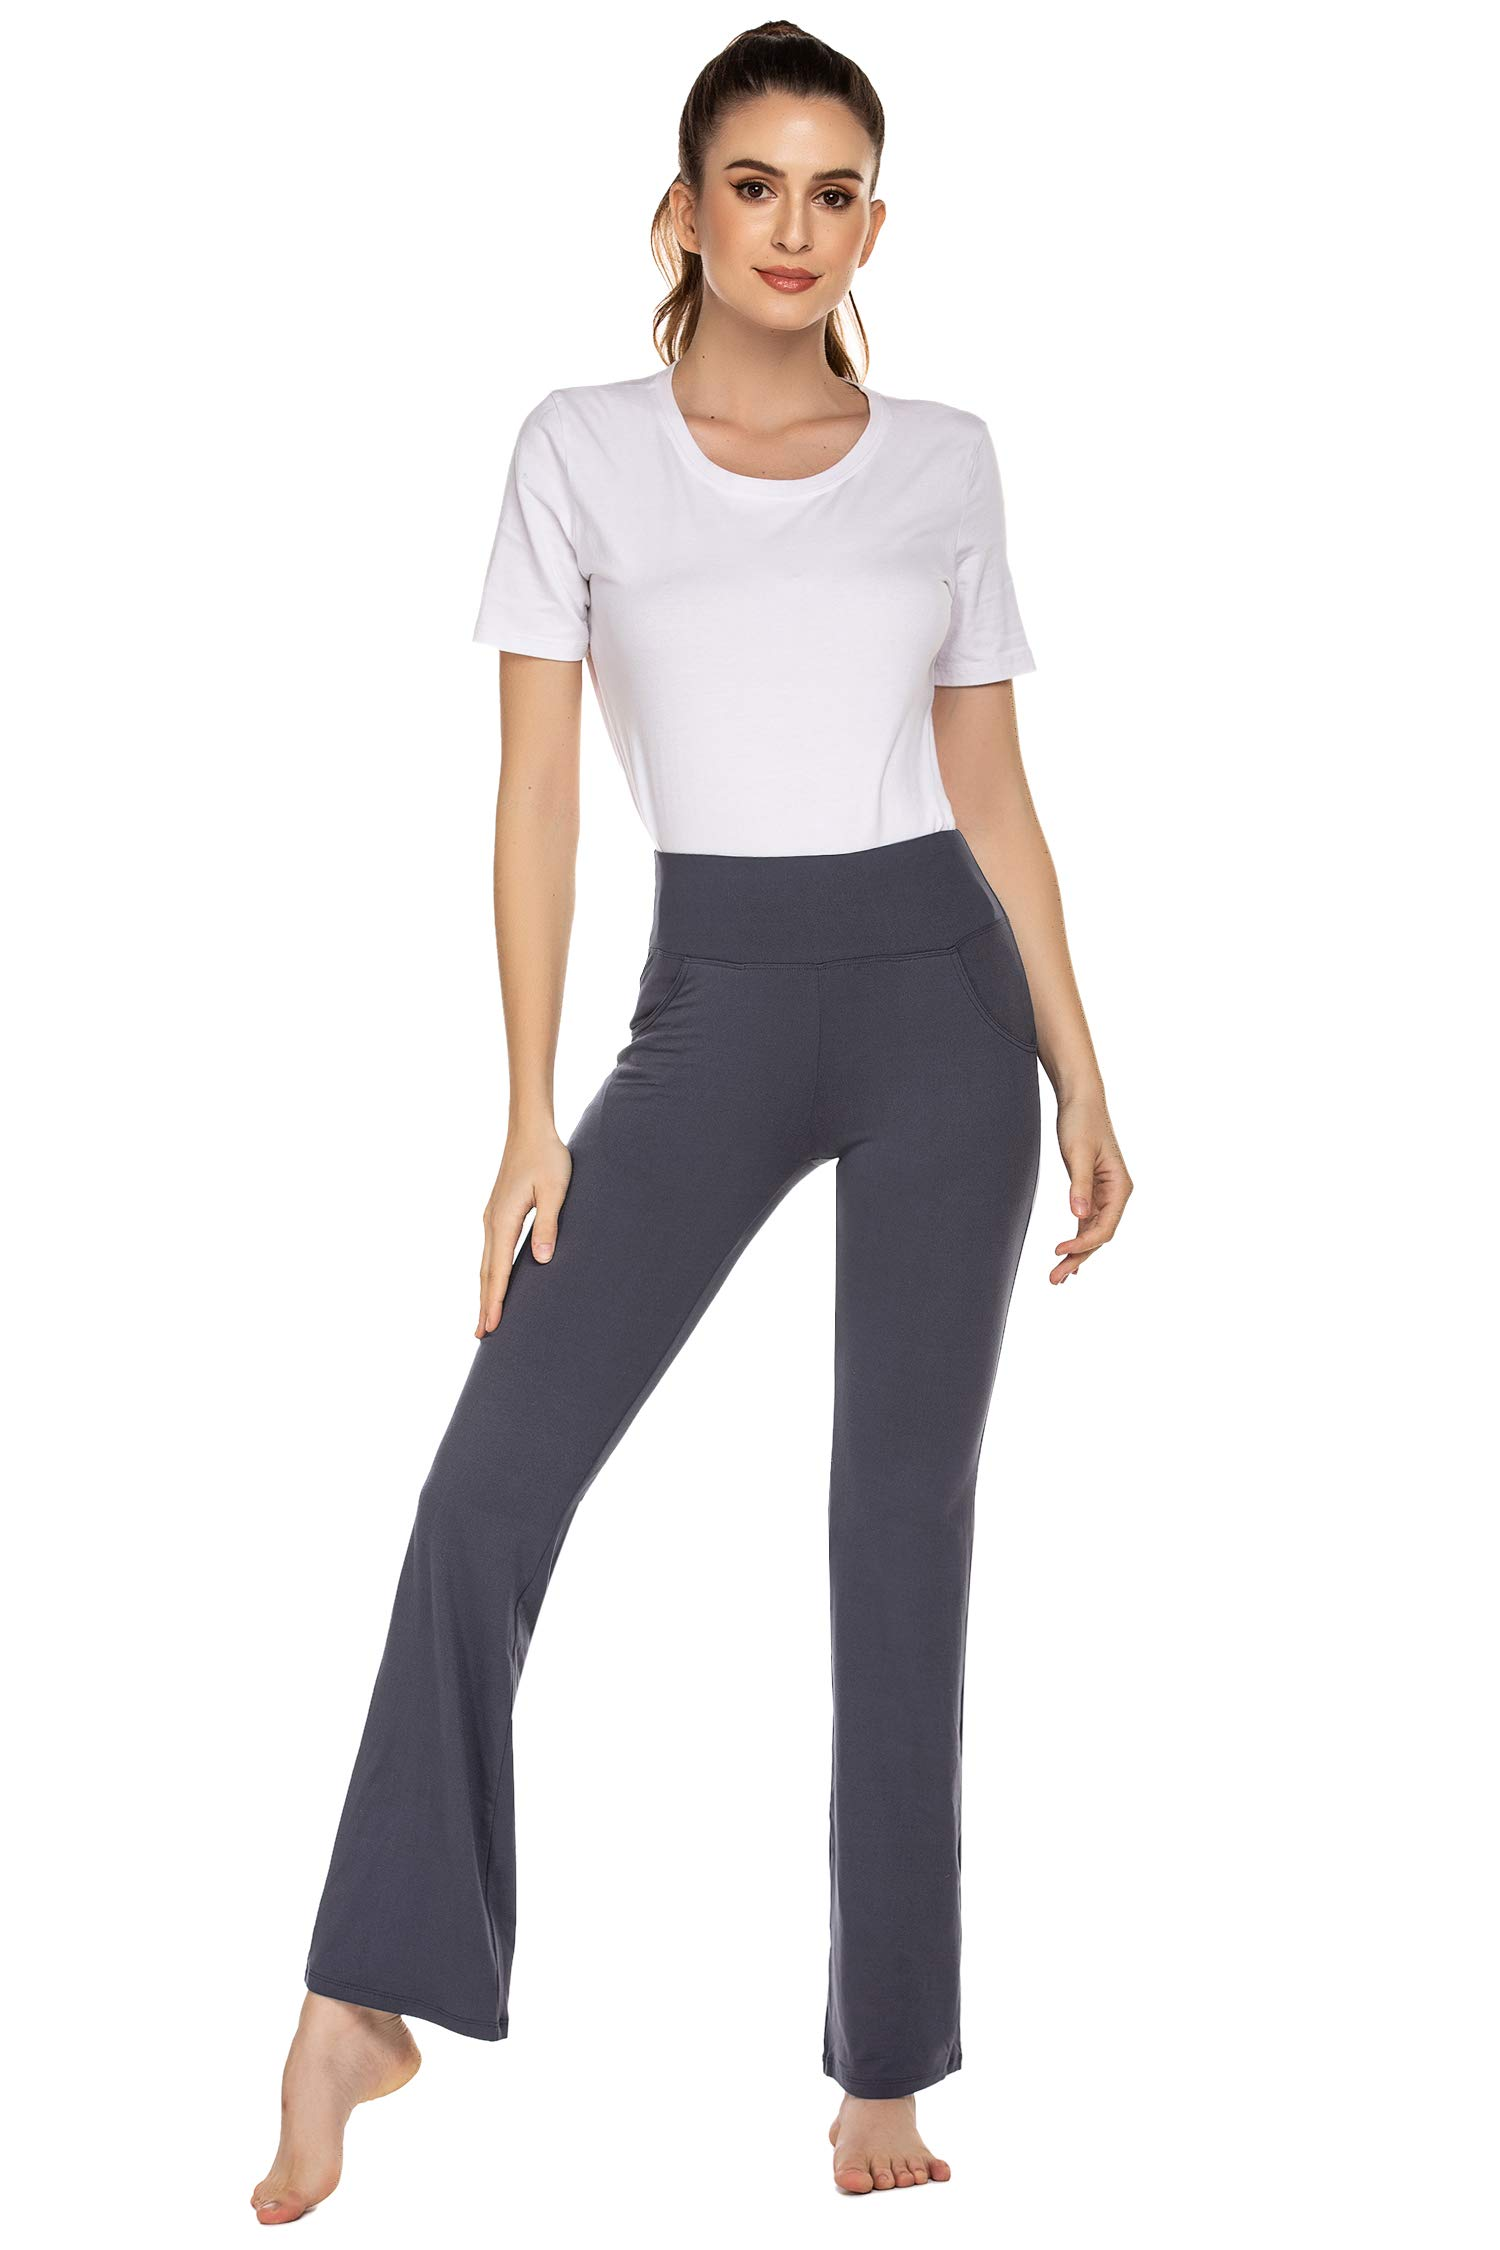 COOrun Women's Bootcut Yoga Pants High Waisted Workout Pants Tummy Control Bootleg Yoga Pants with Pockets